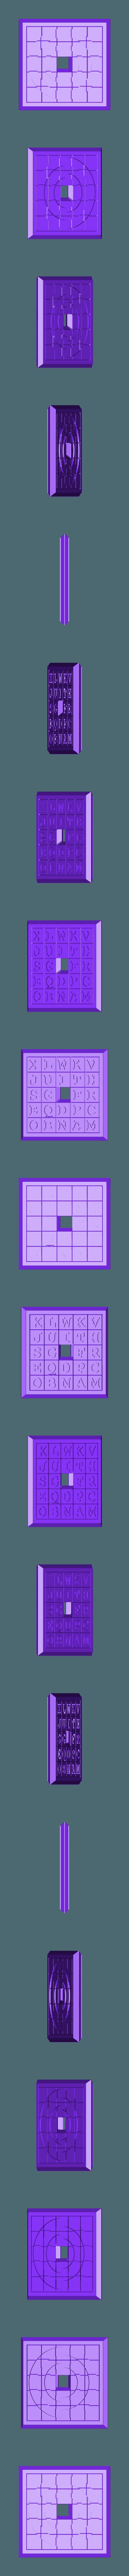 Sliding5x5Puzzle5.stl Download STL file Two Sided Sliding Puzzle • 3D printable model, Jinja